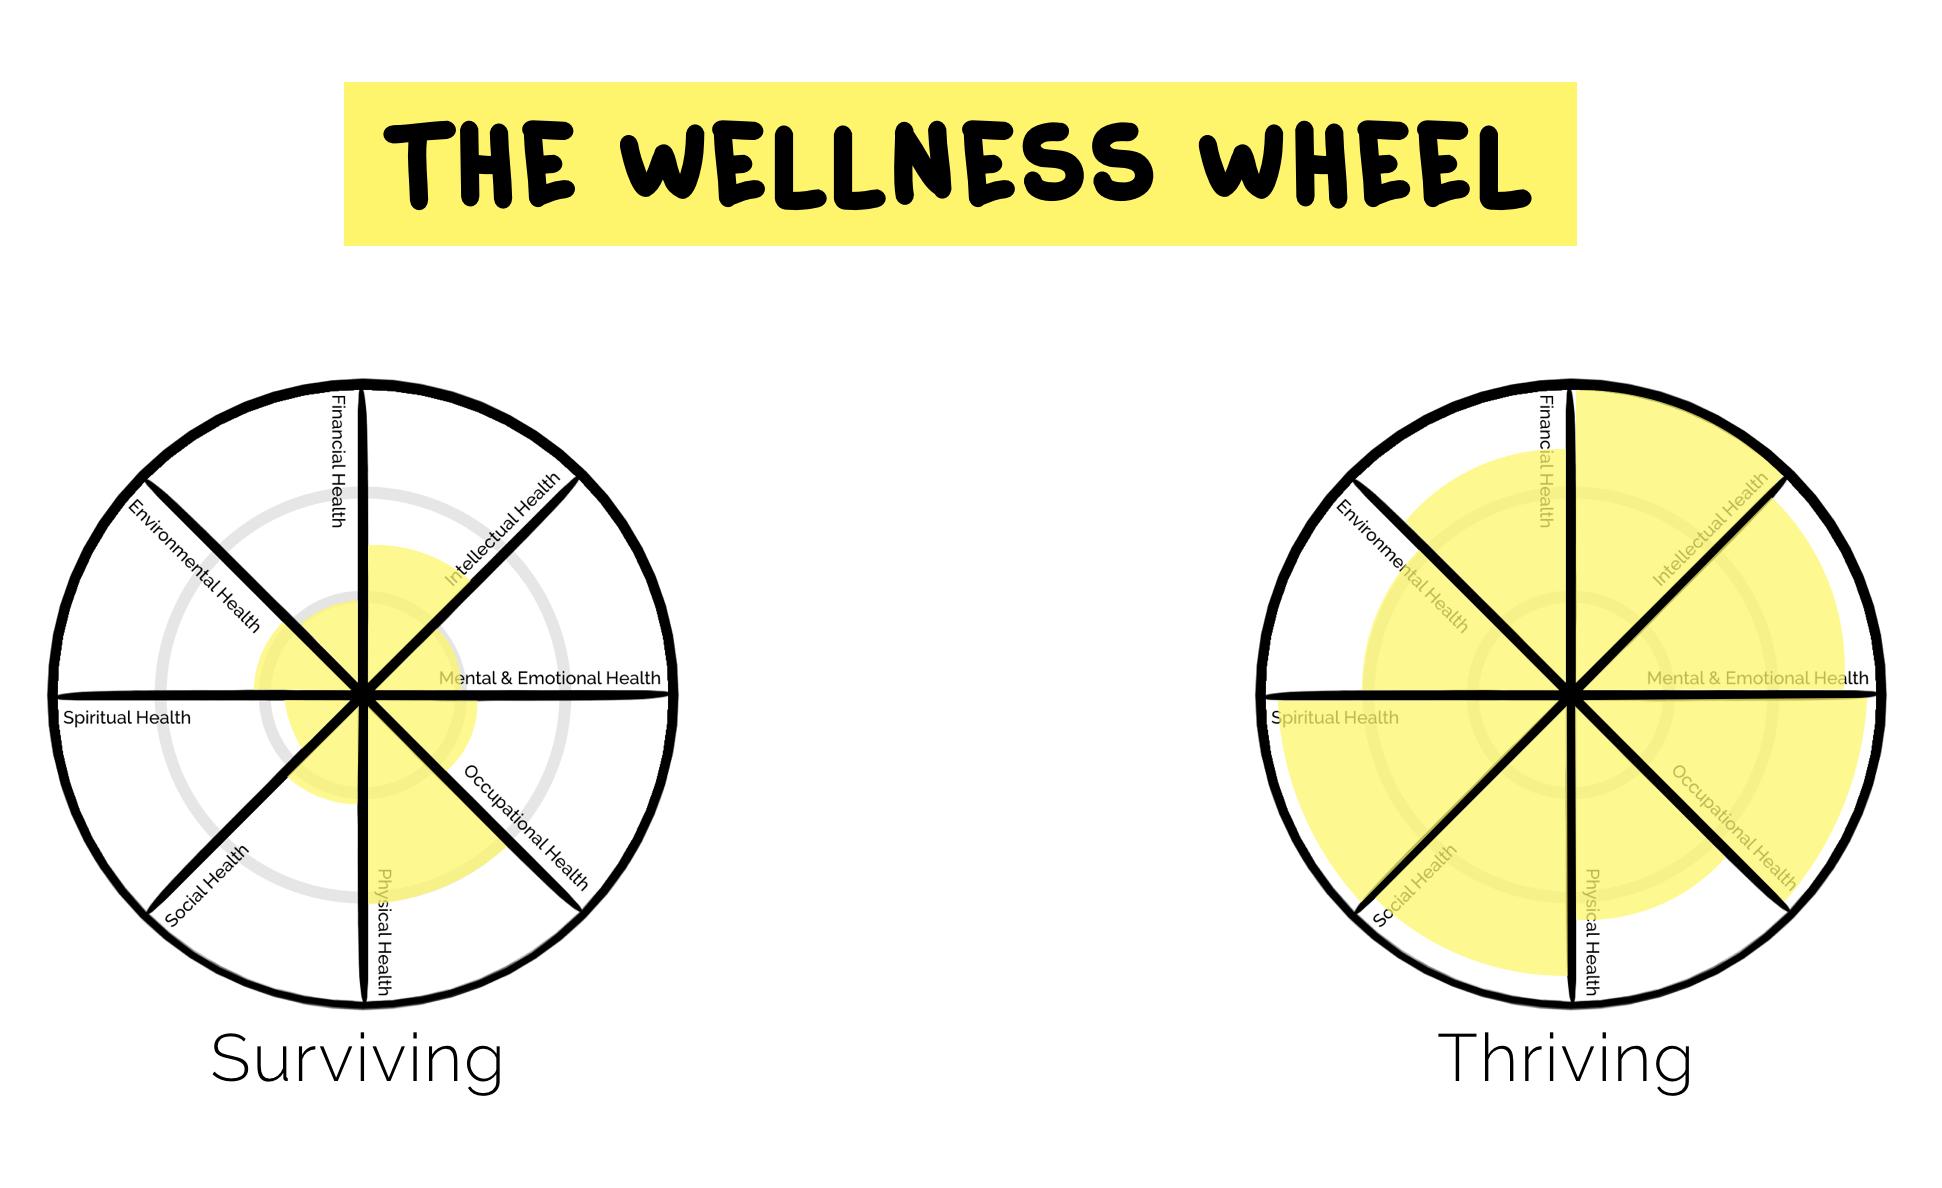 Wellness Wheel - Thriving vs. Surviving